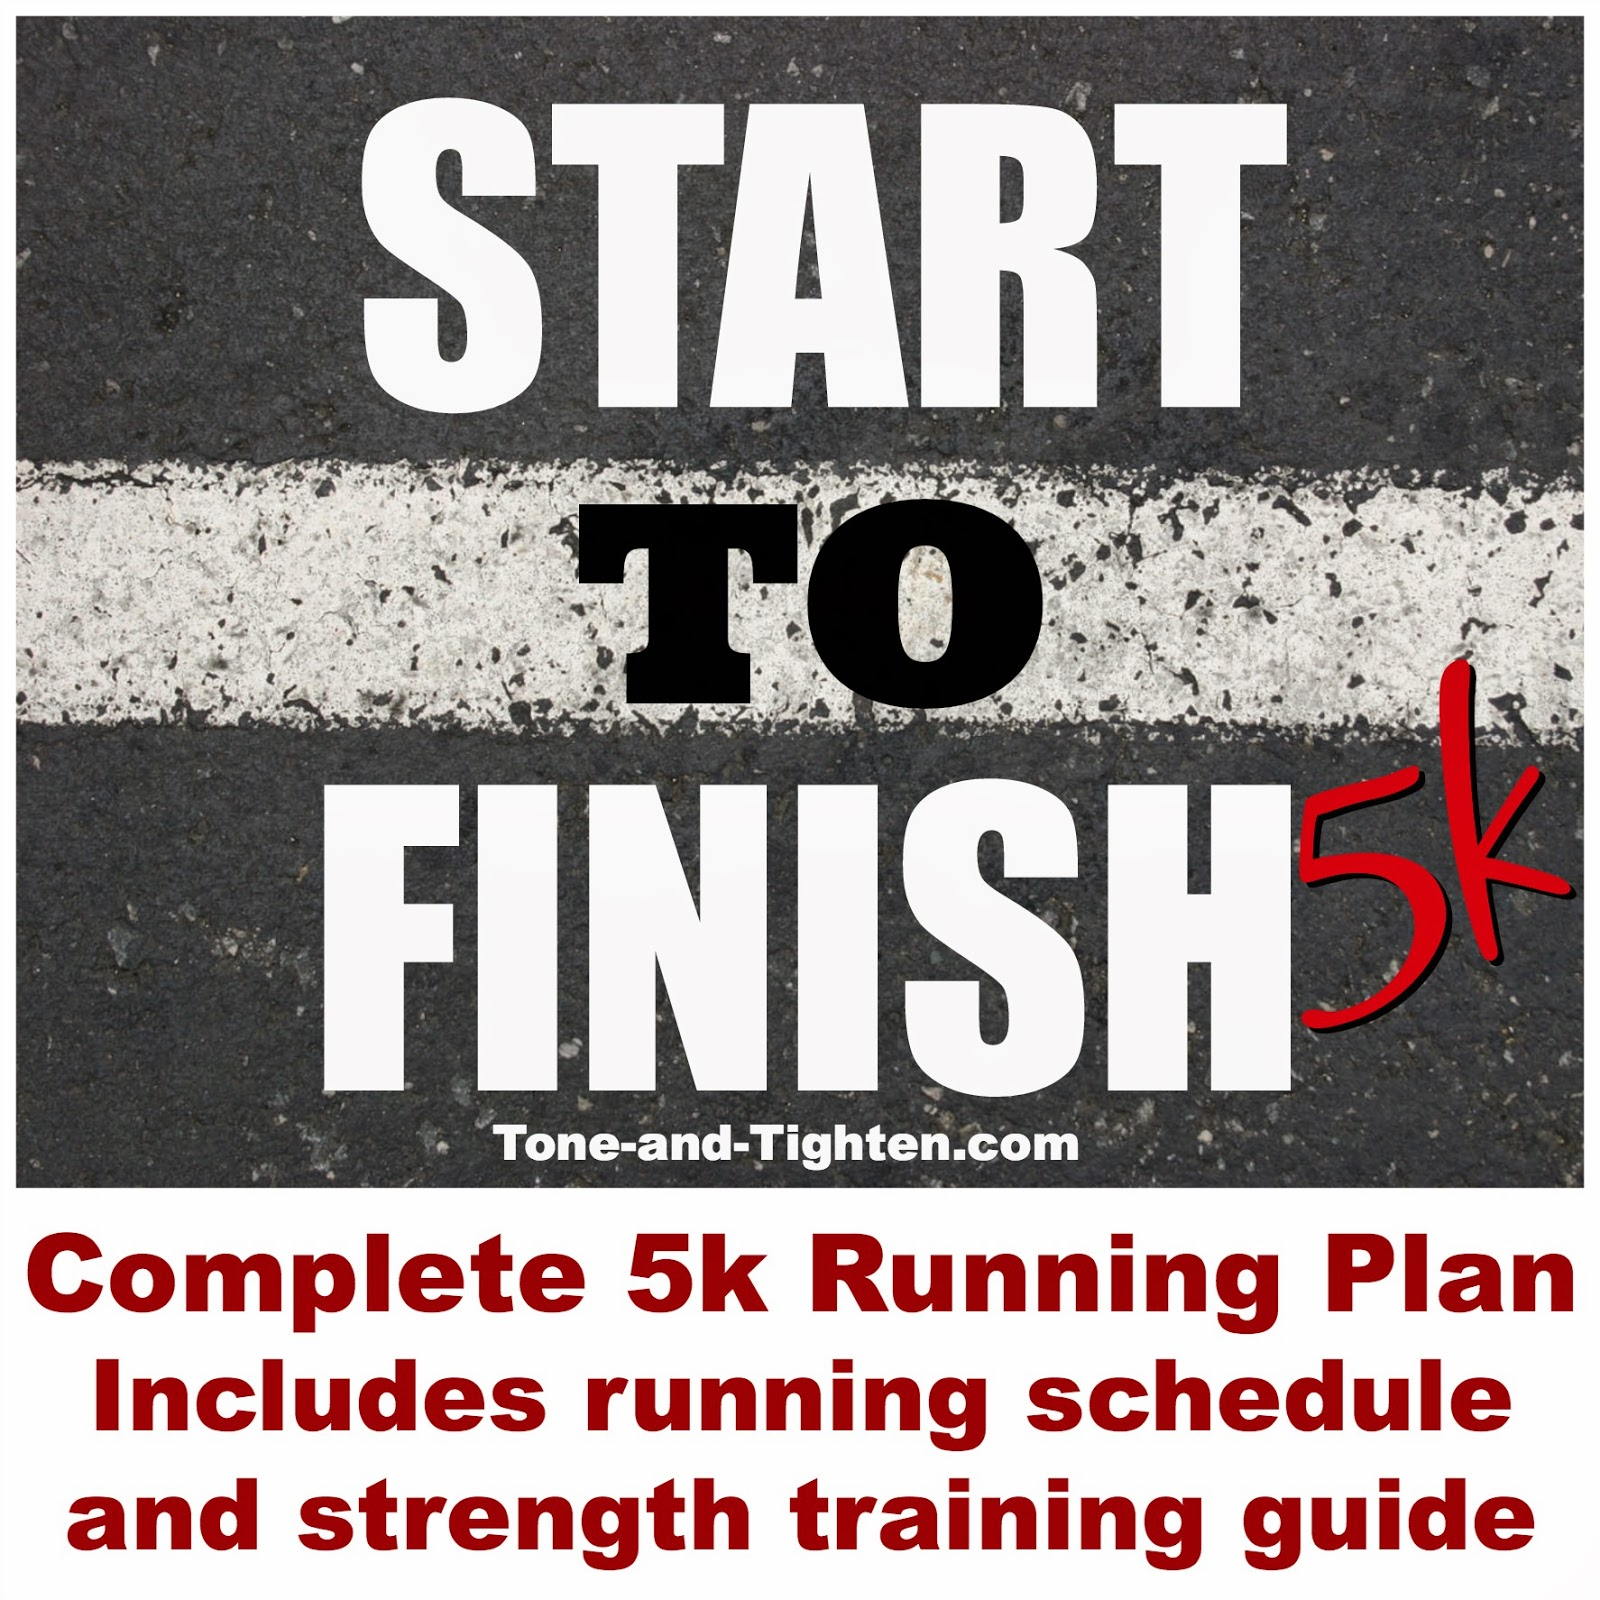 http://tone-and-tighten.com/2014/03/start-to-finish-5k-free-downloadable-5k-running-program.html